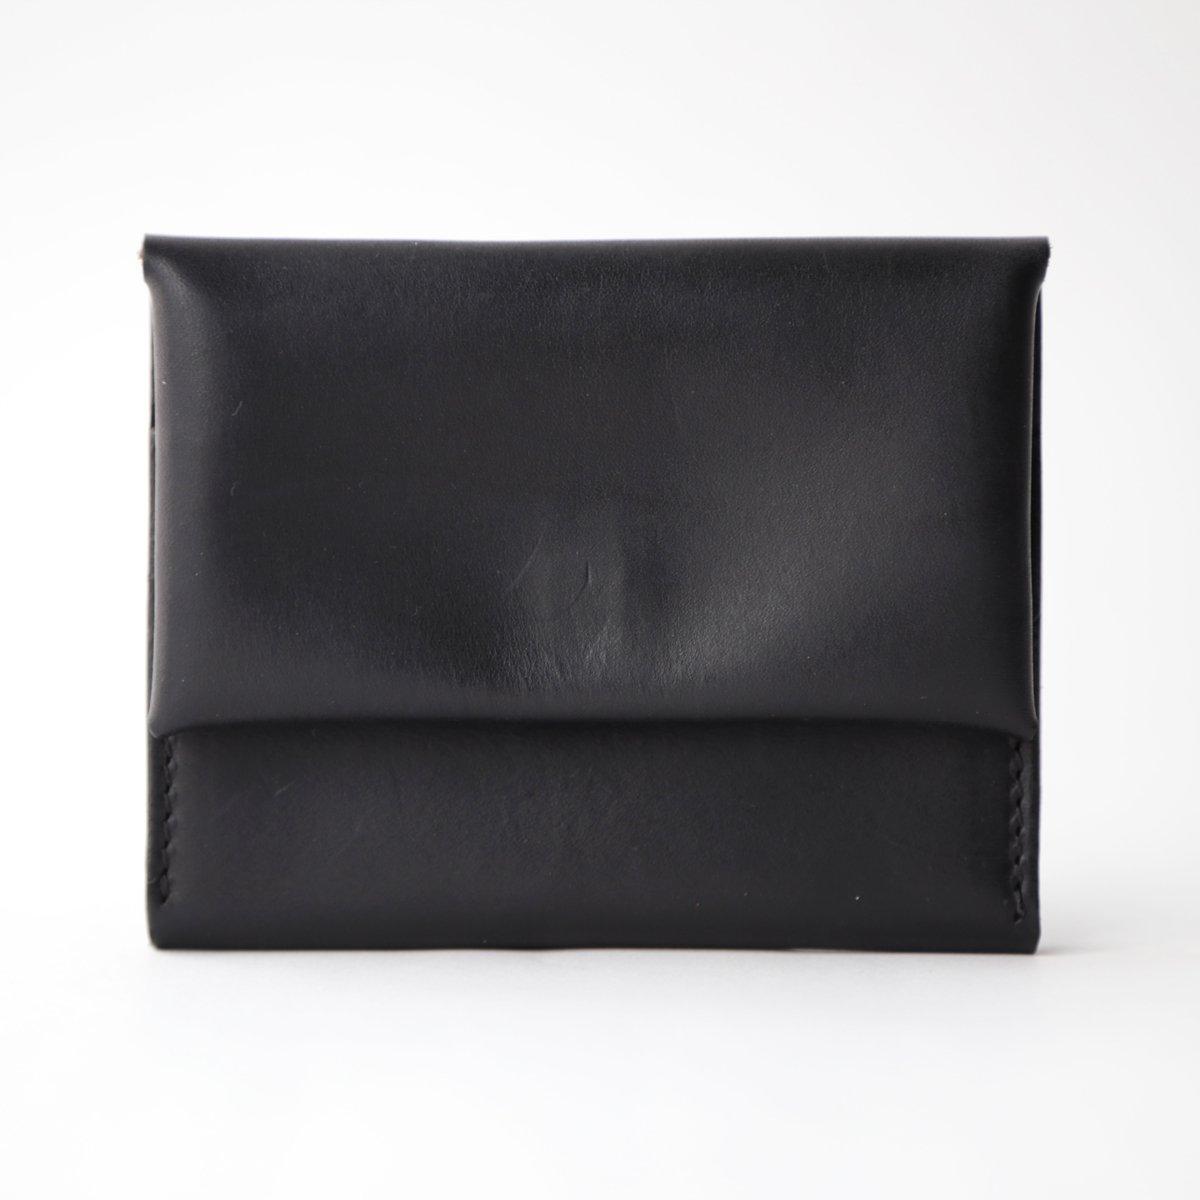 EEL Products × Tochca Coin Purse Elbamatt  Black